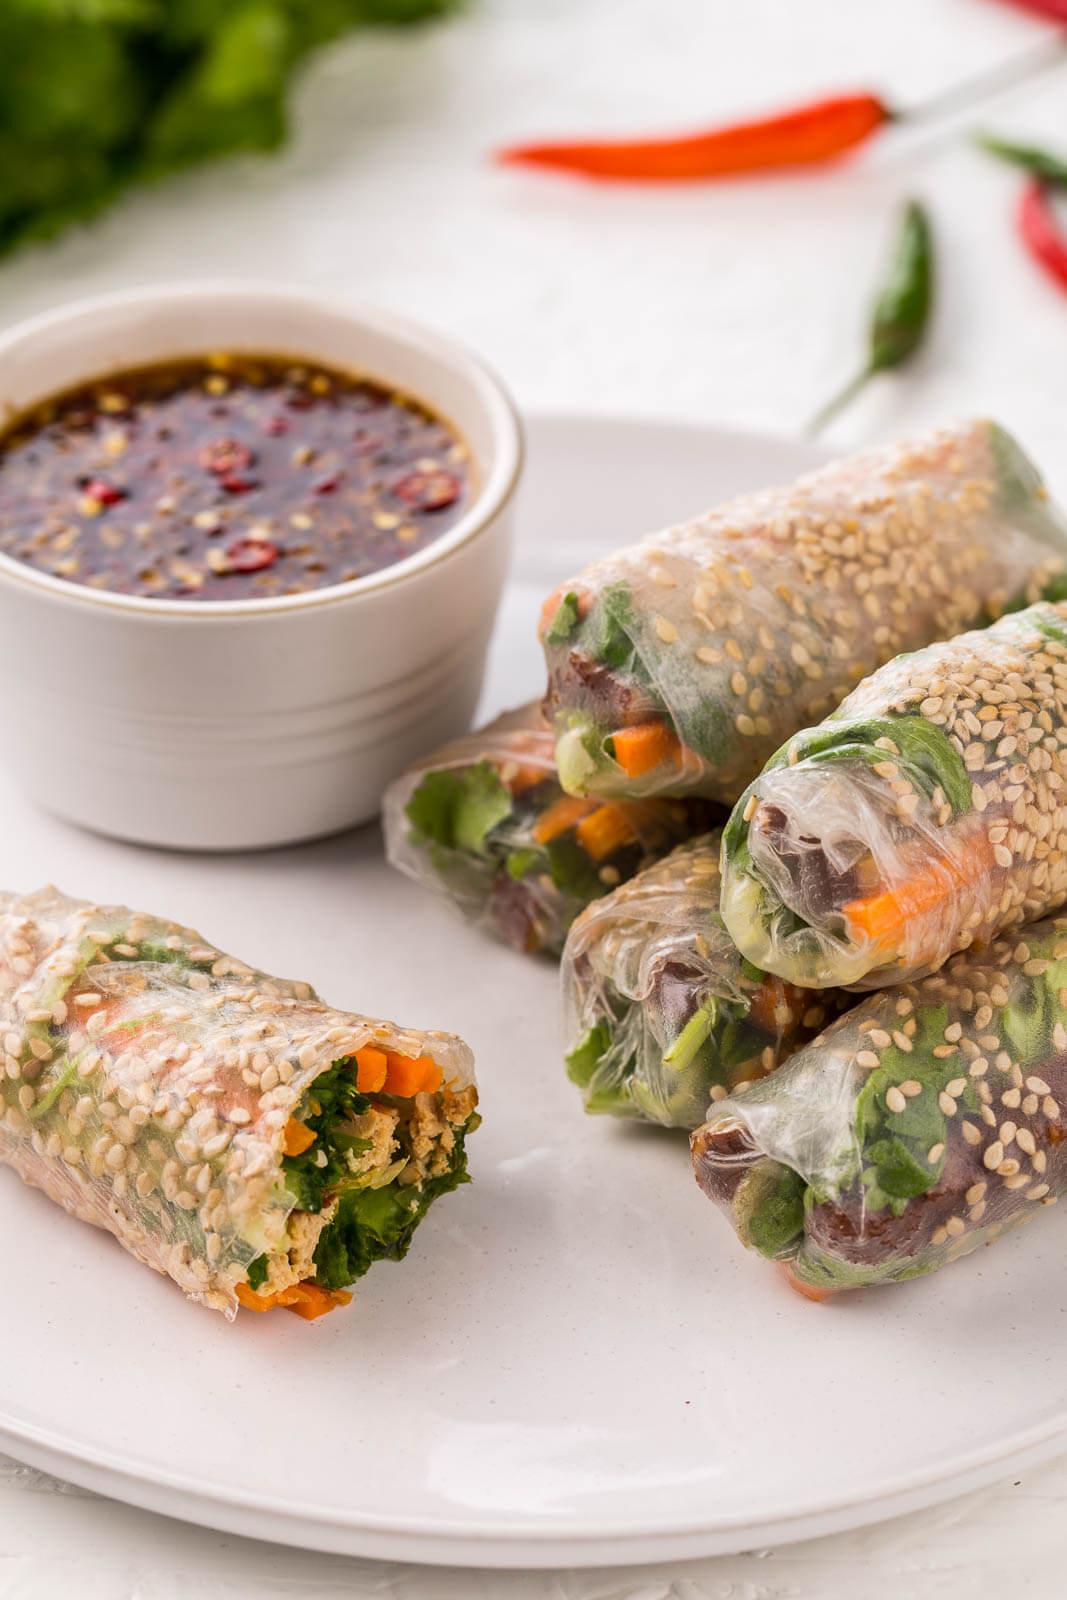 8.Vietnamese Tofu Summer Rolls